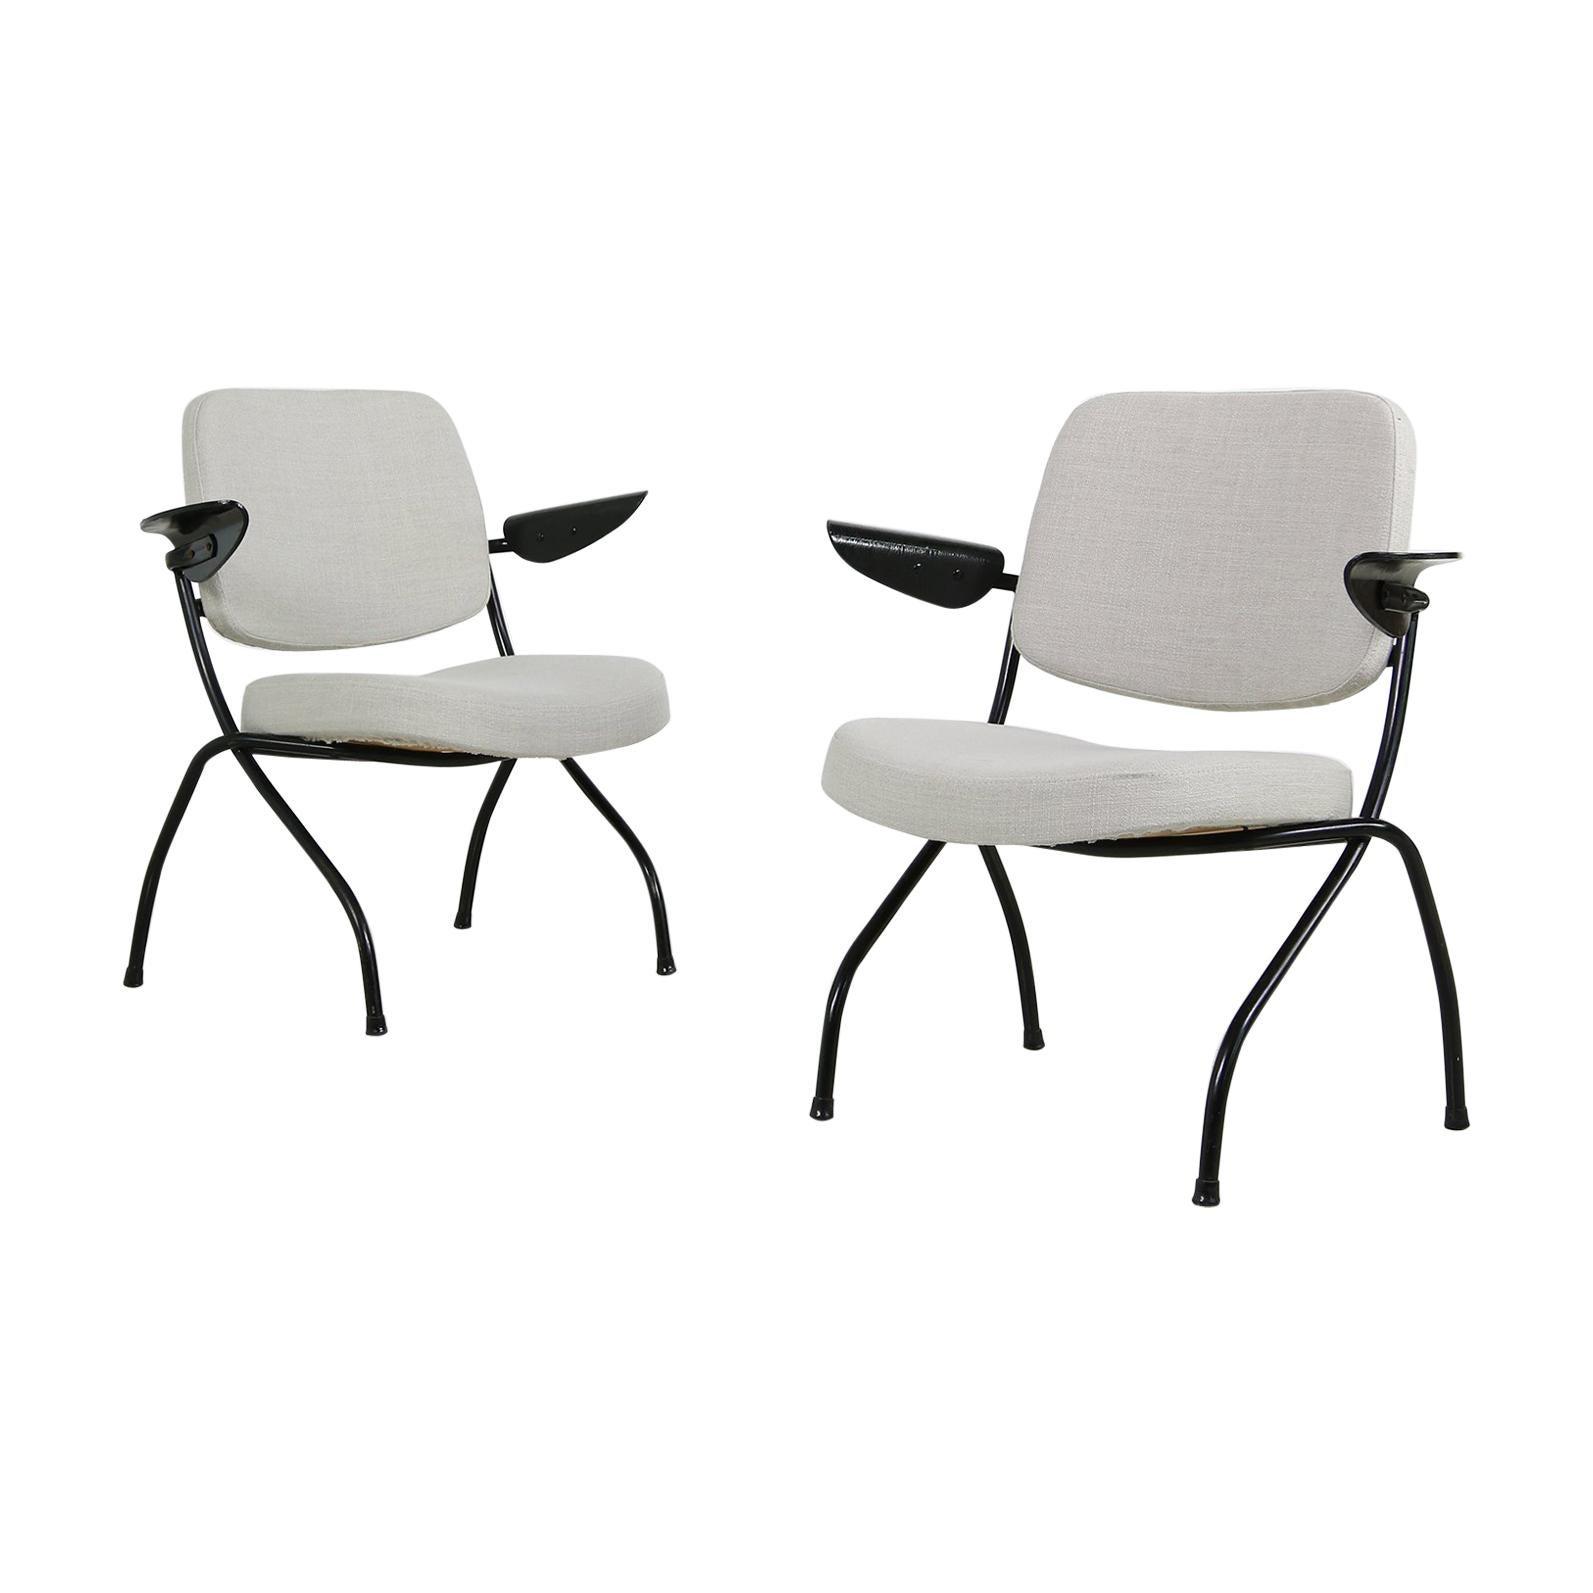 Pair of 1950s Ilmari Tapiovaara Scandinavian Organic Lounge Chairs, Midcentury